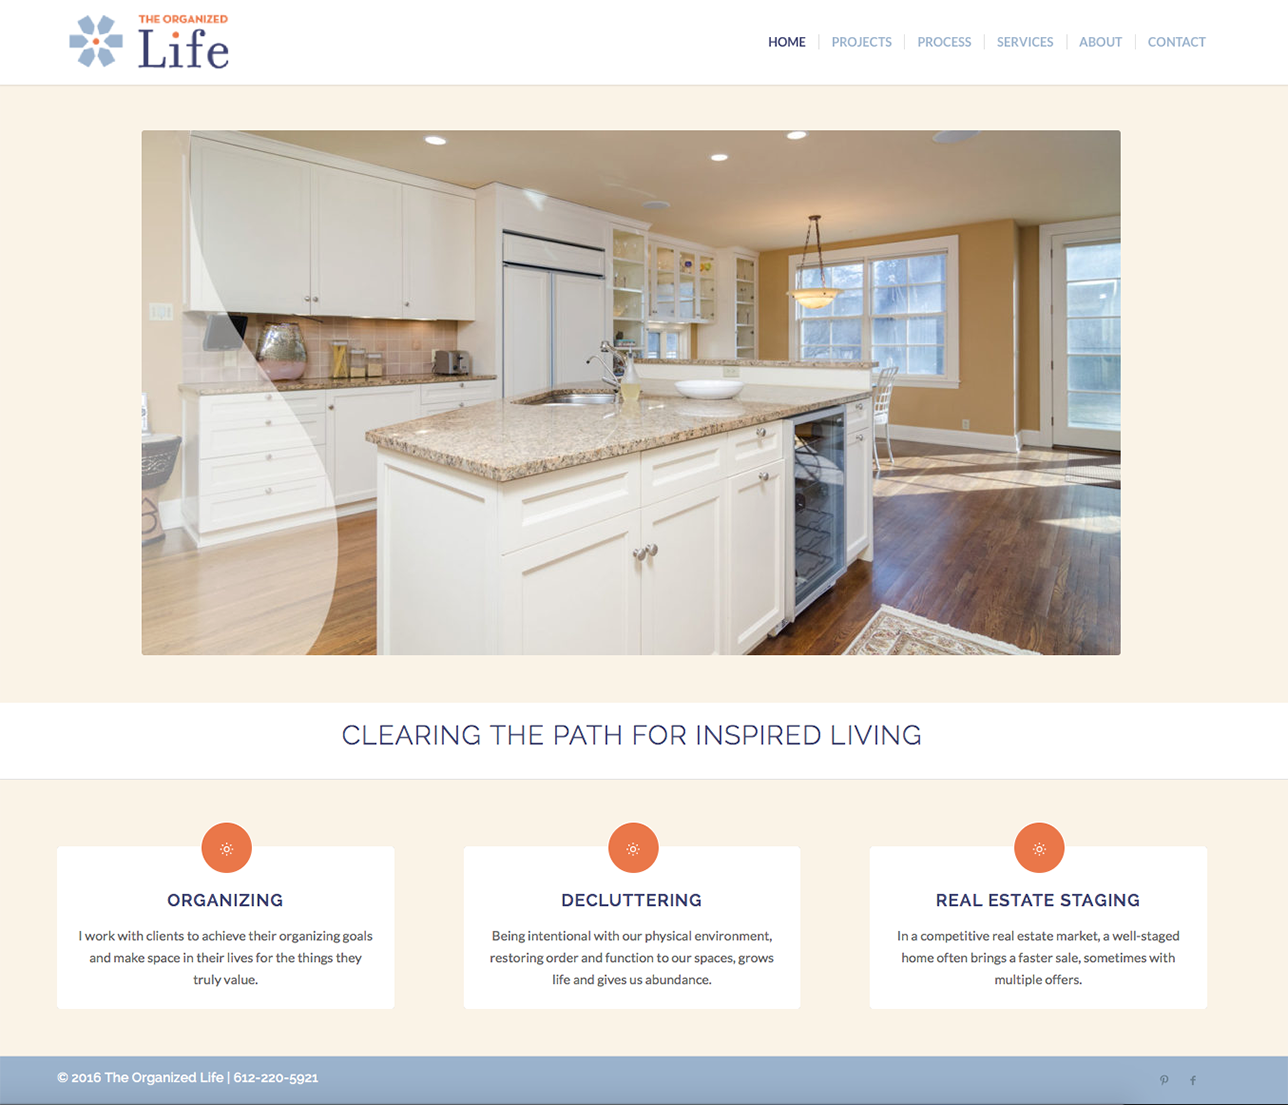 Small Business services Website by Wojack Hendrickson Design